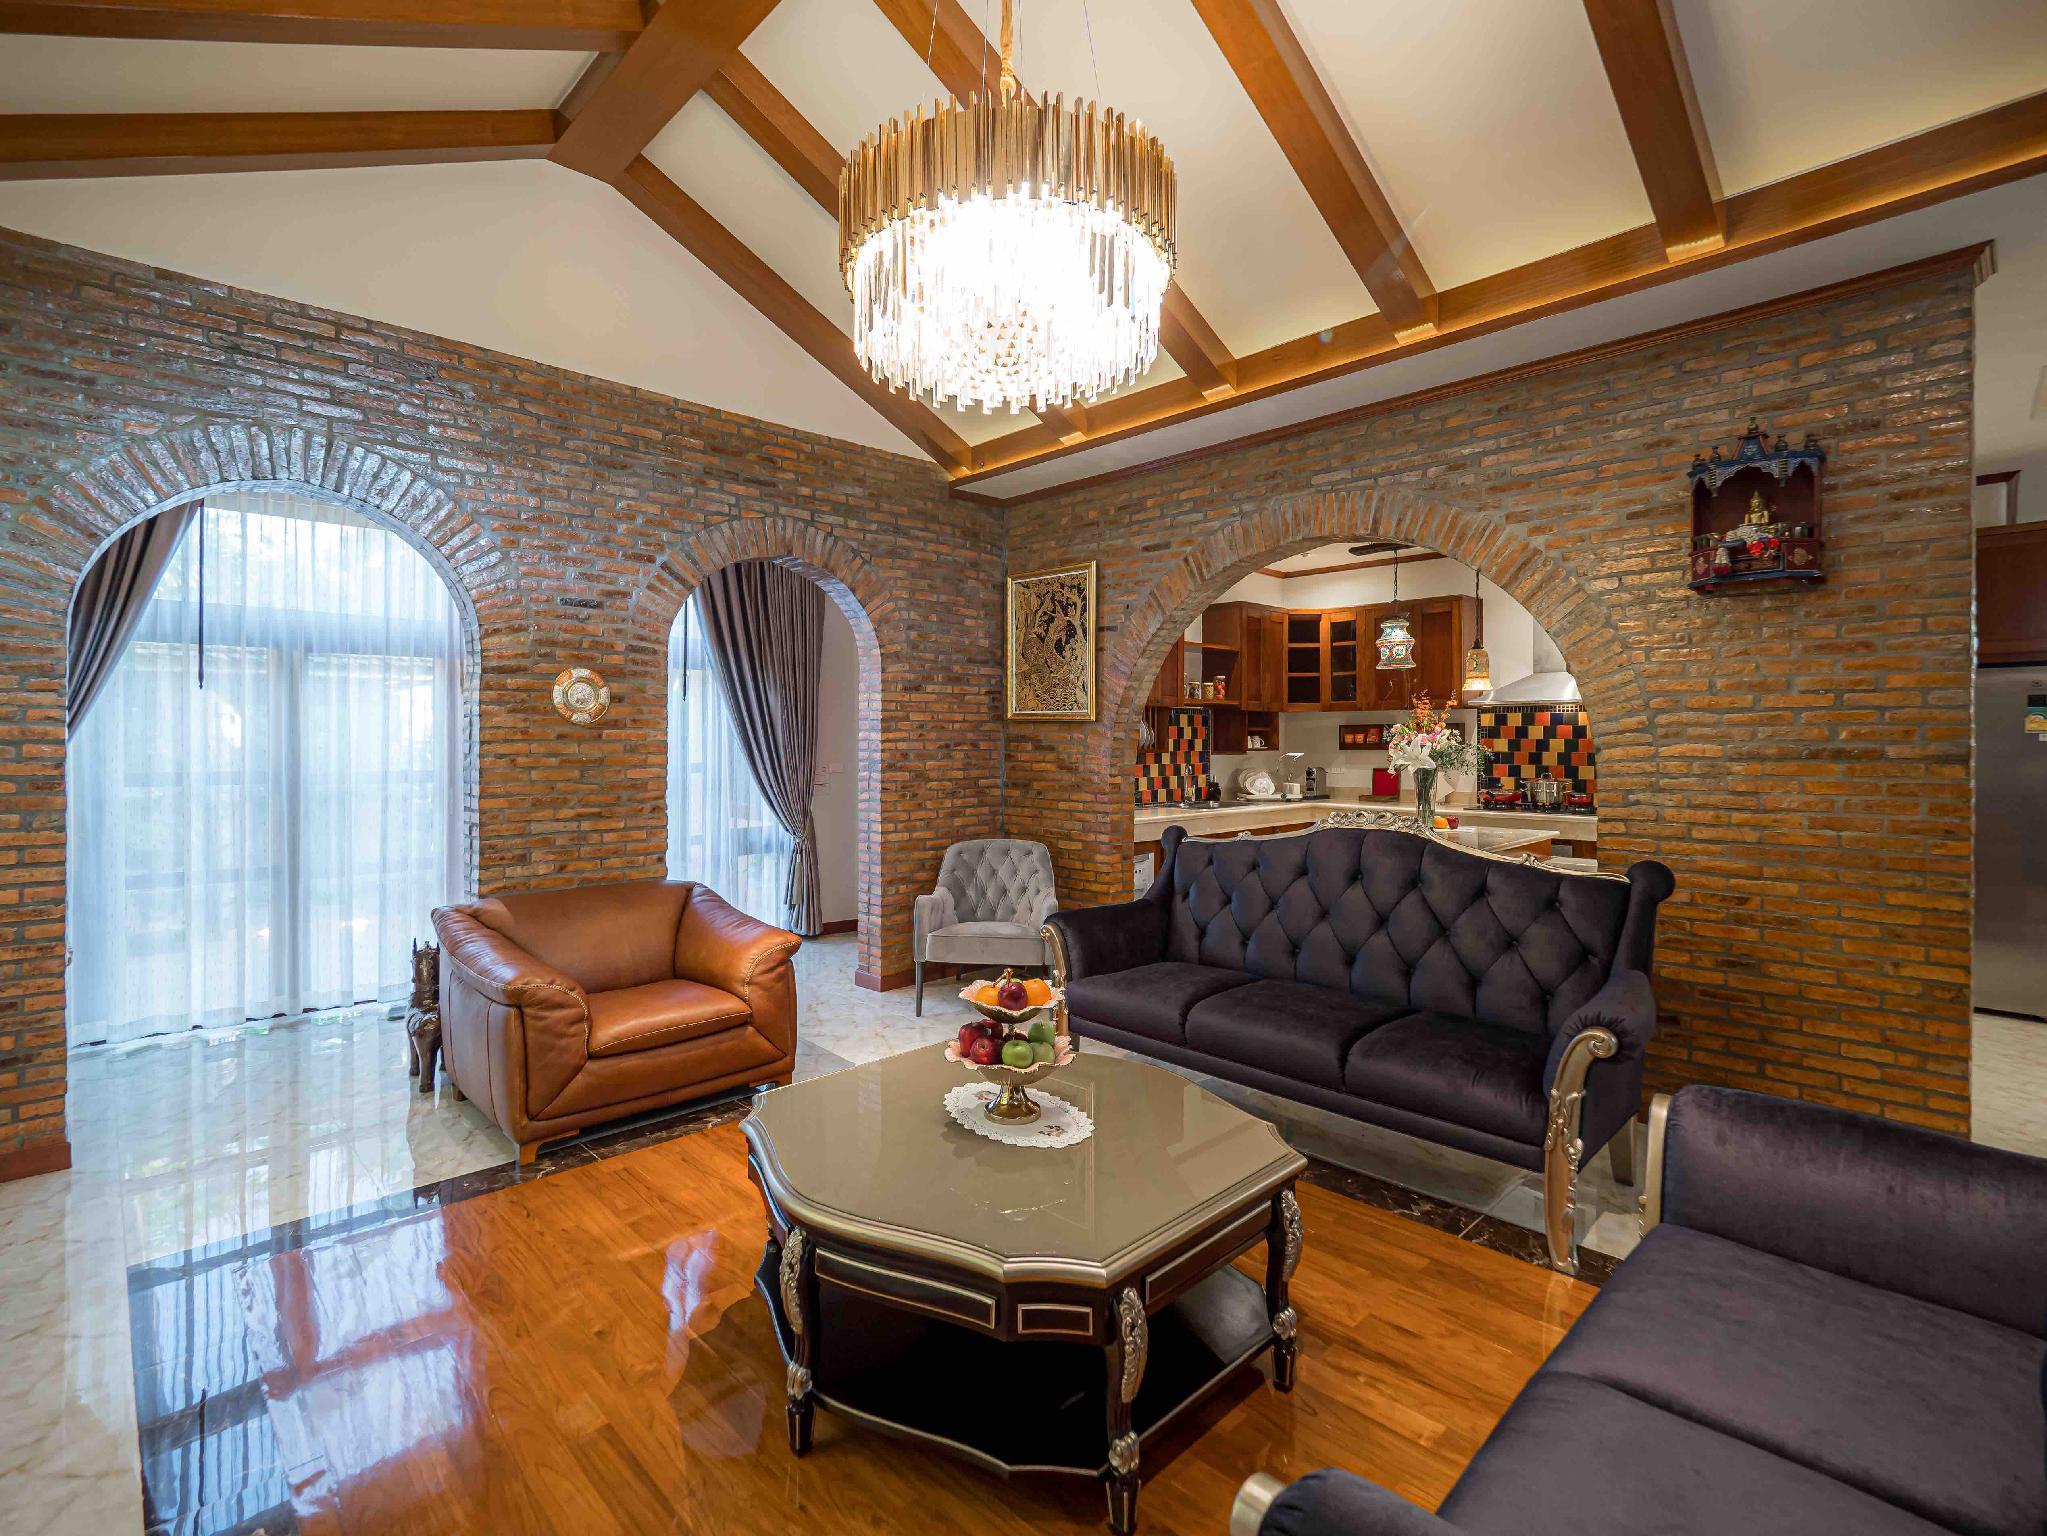 Modern Love Villa/new/free breakfast/car วิลลา 5 ห้องนอน 5 ห้องน้ำส่วนตัว ขนาด 410 ตร.ม. – หางดง